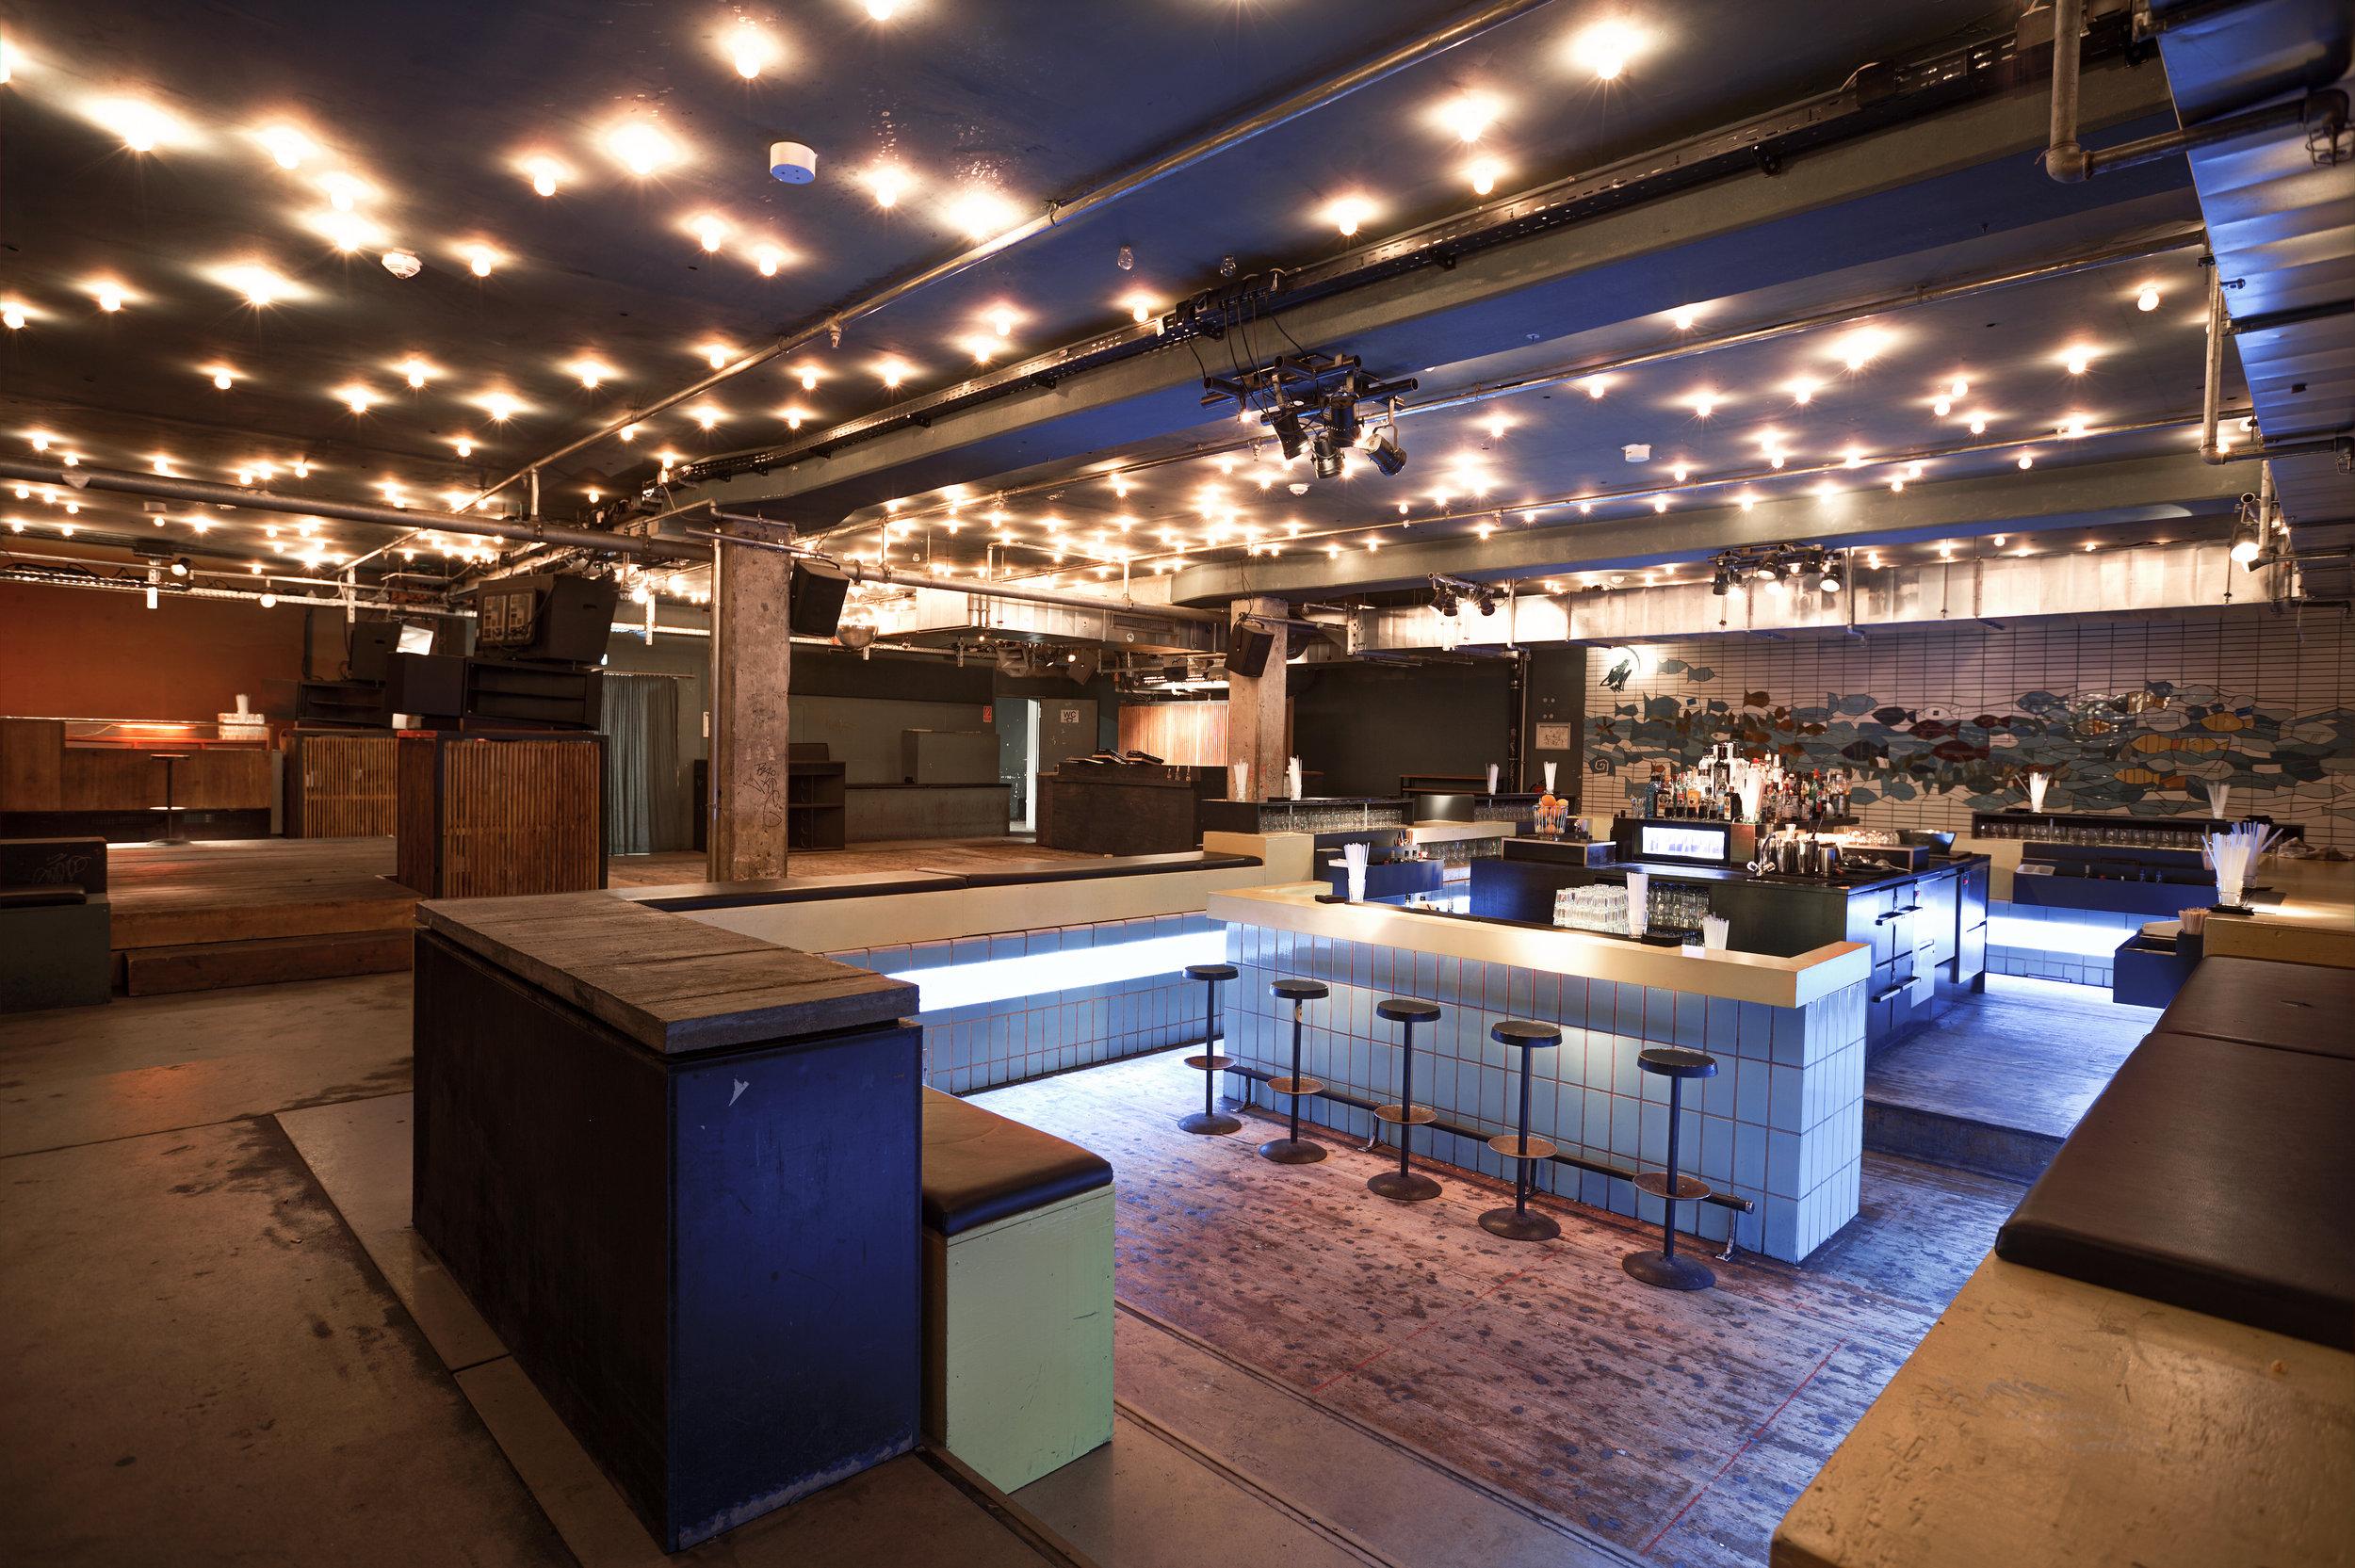 Bar+Dancefloor_FotoTimKraehnke.com.jpg